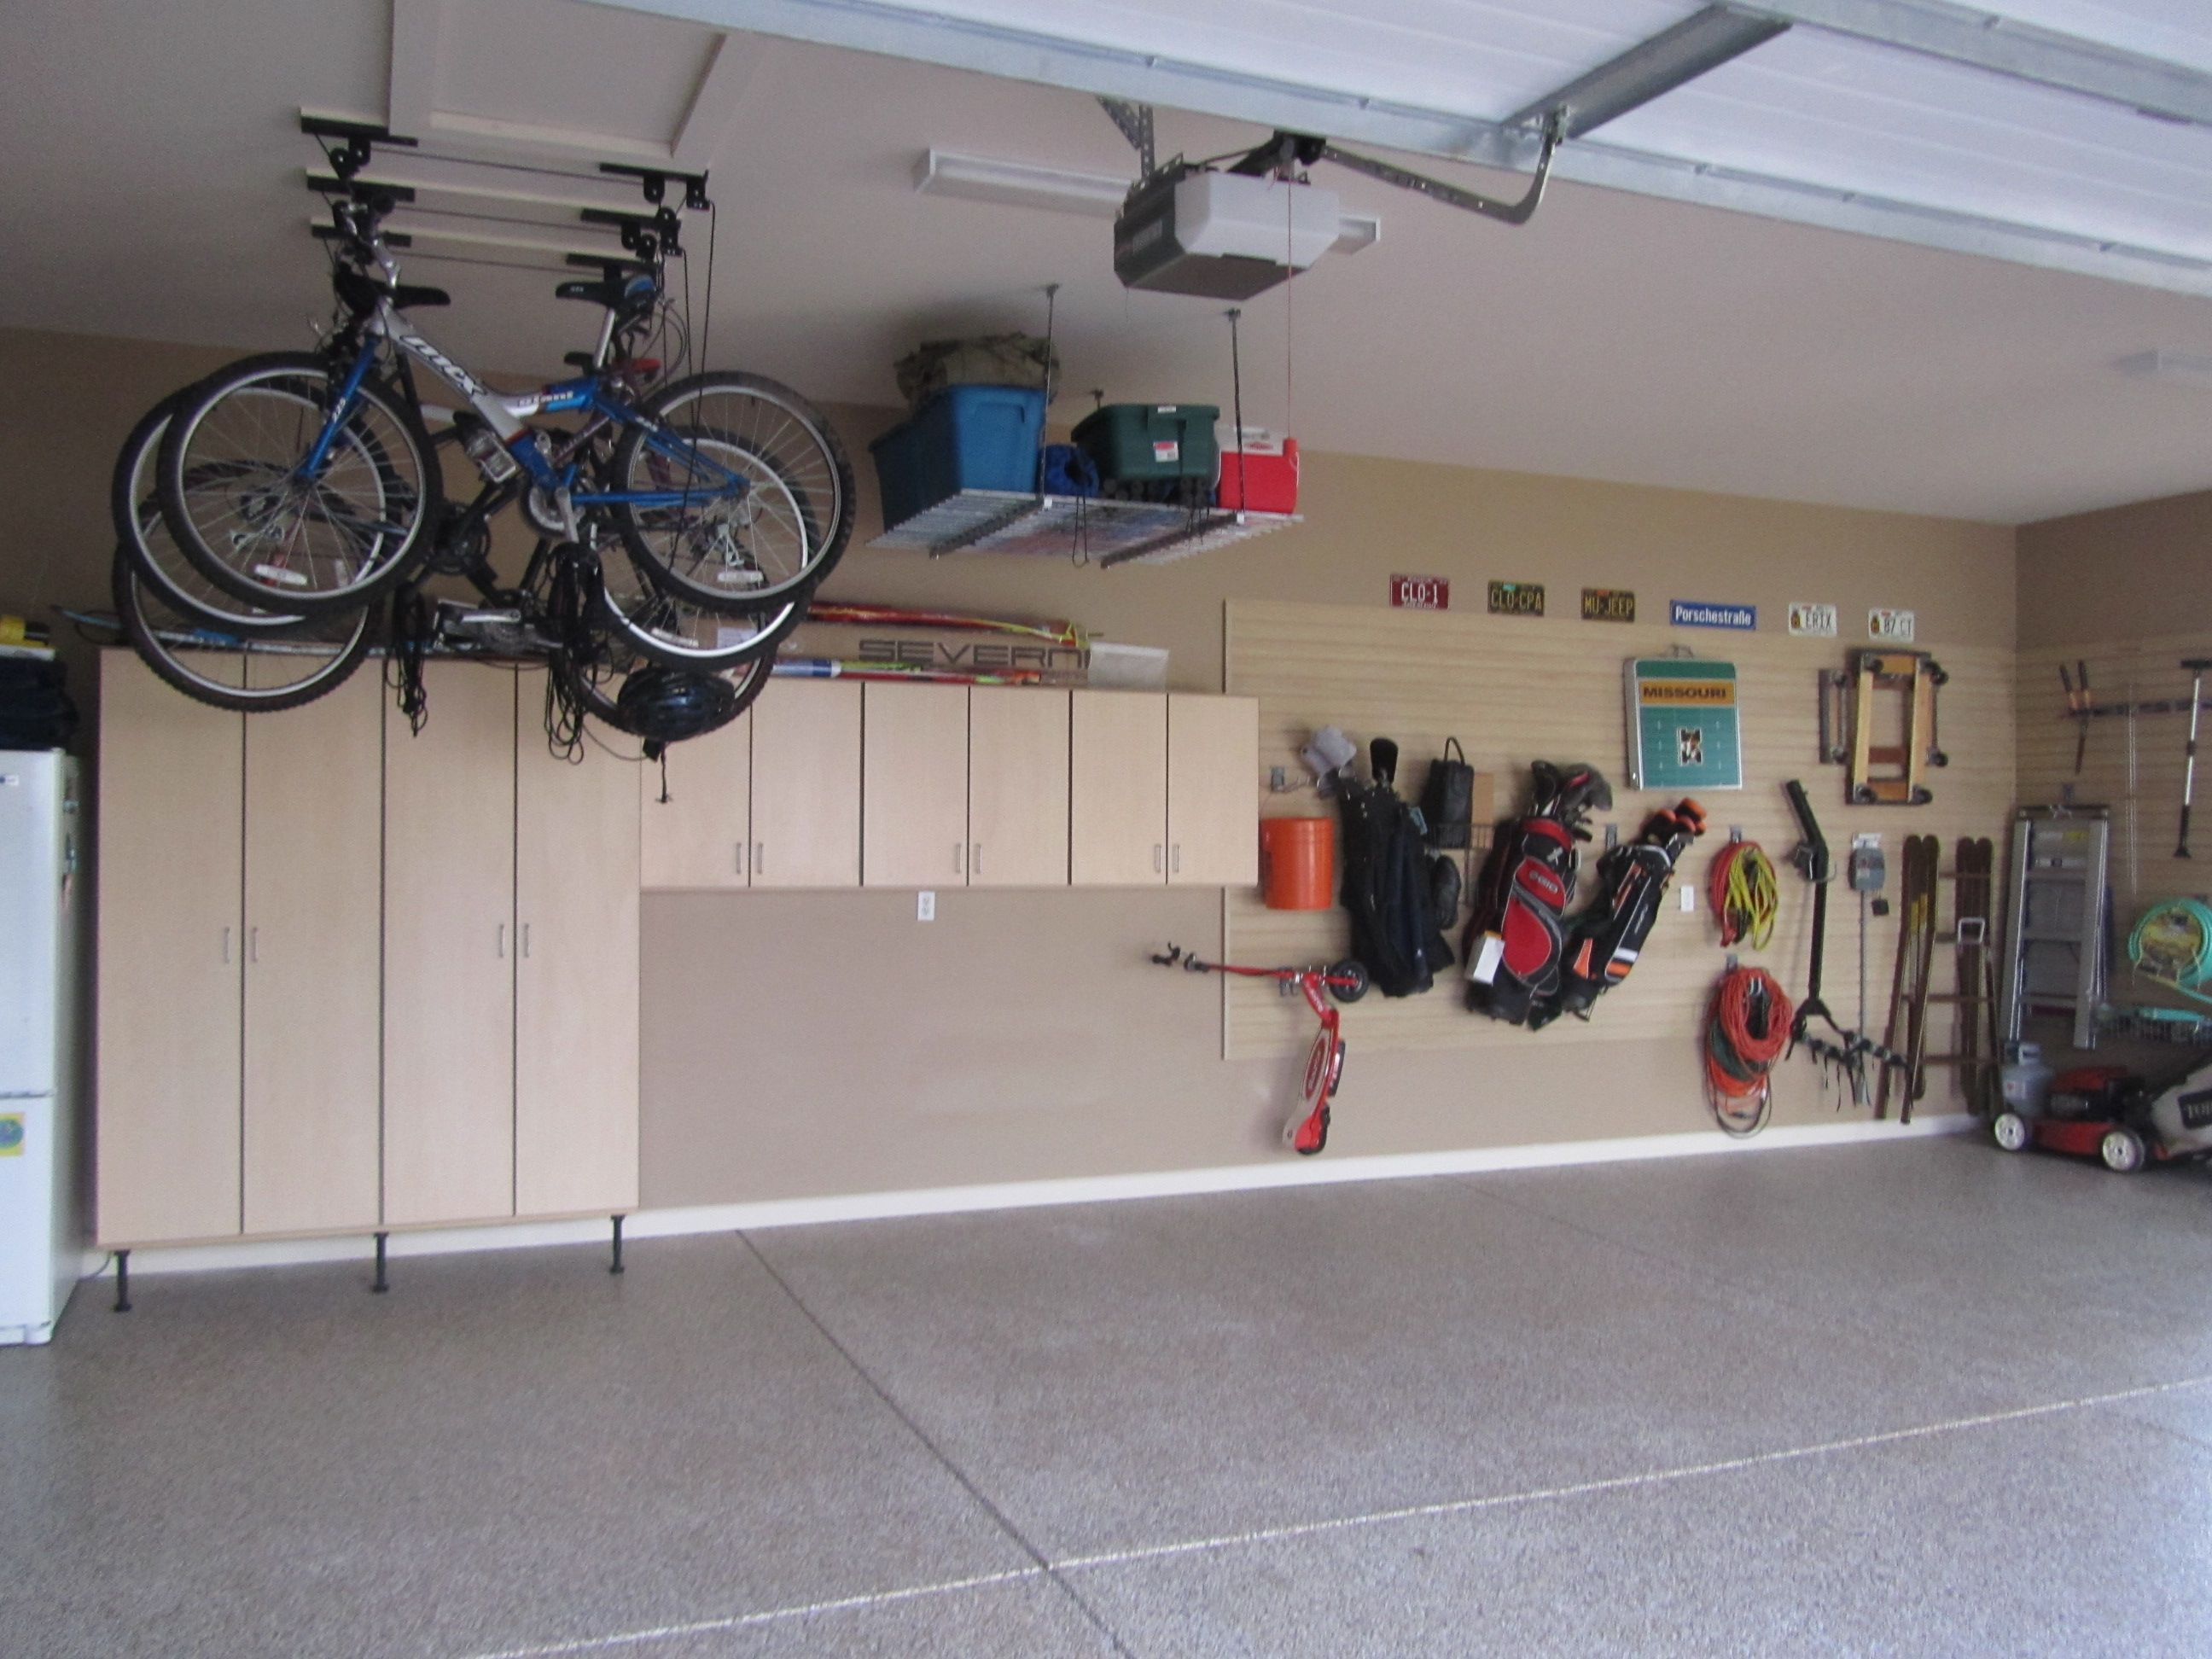 Garage Winter Prep Made Easy With 3 Simple Steps Garage Design